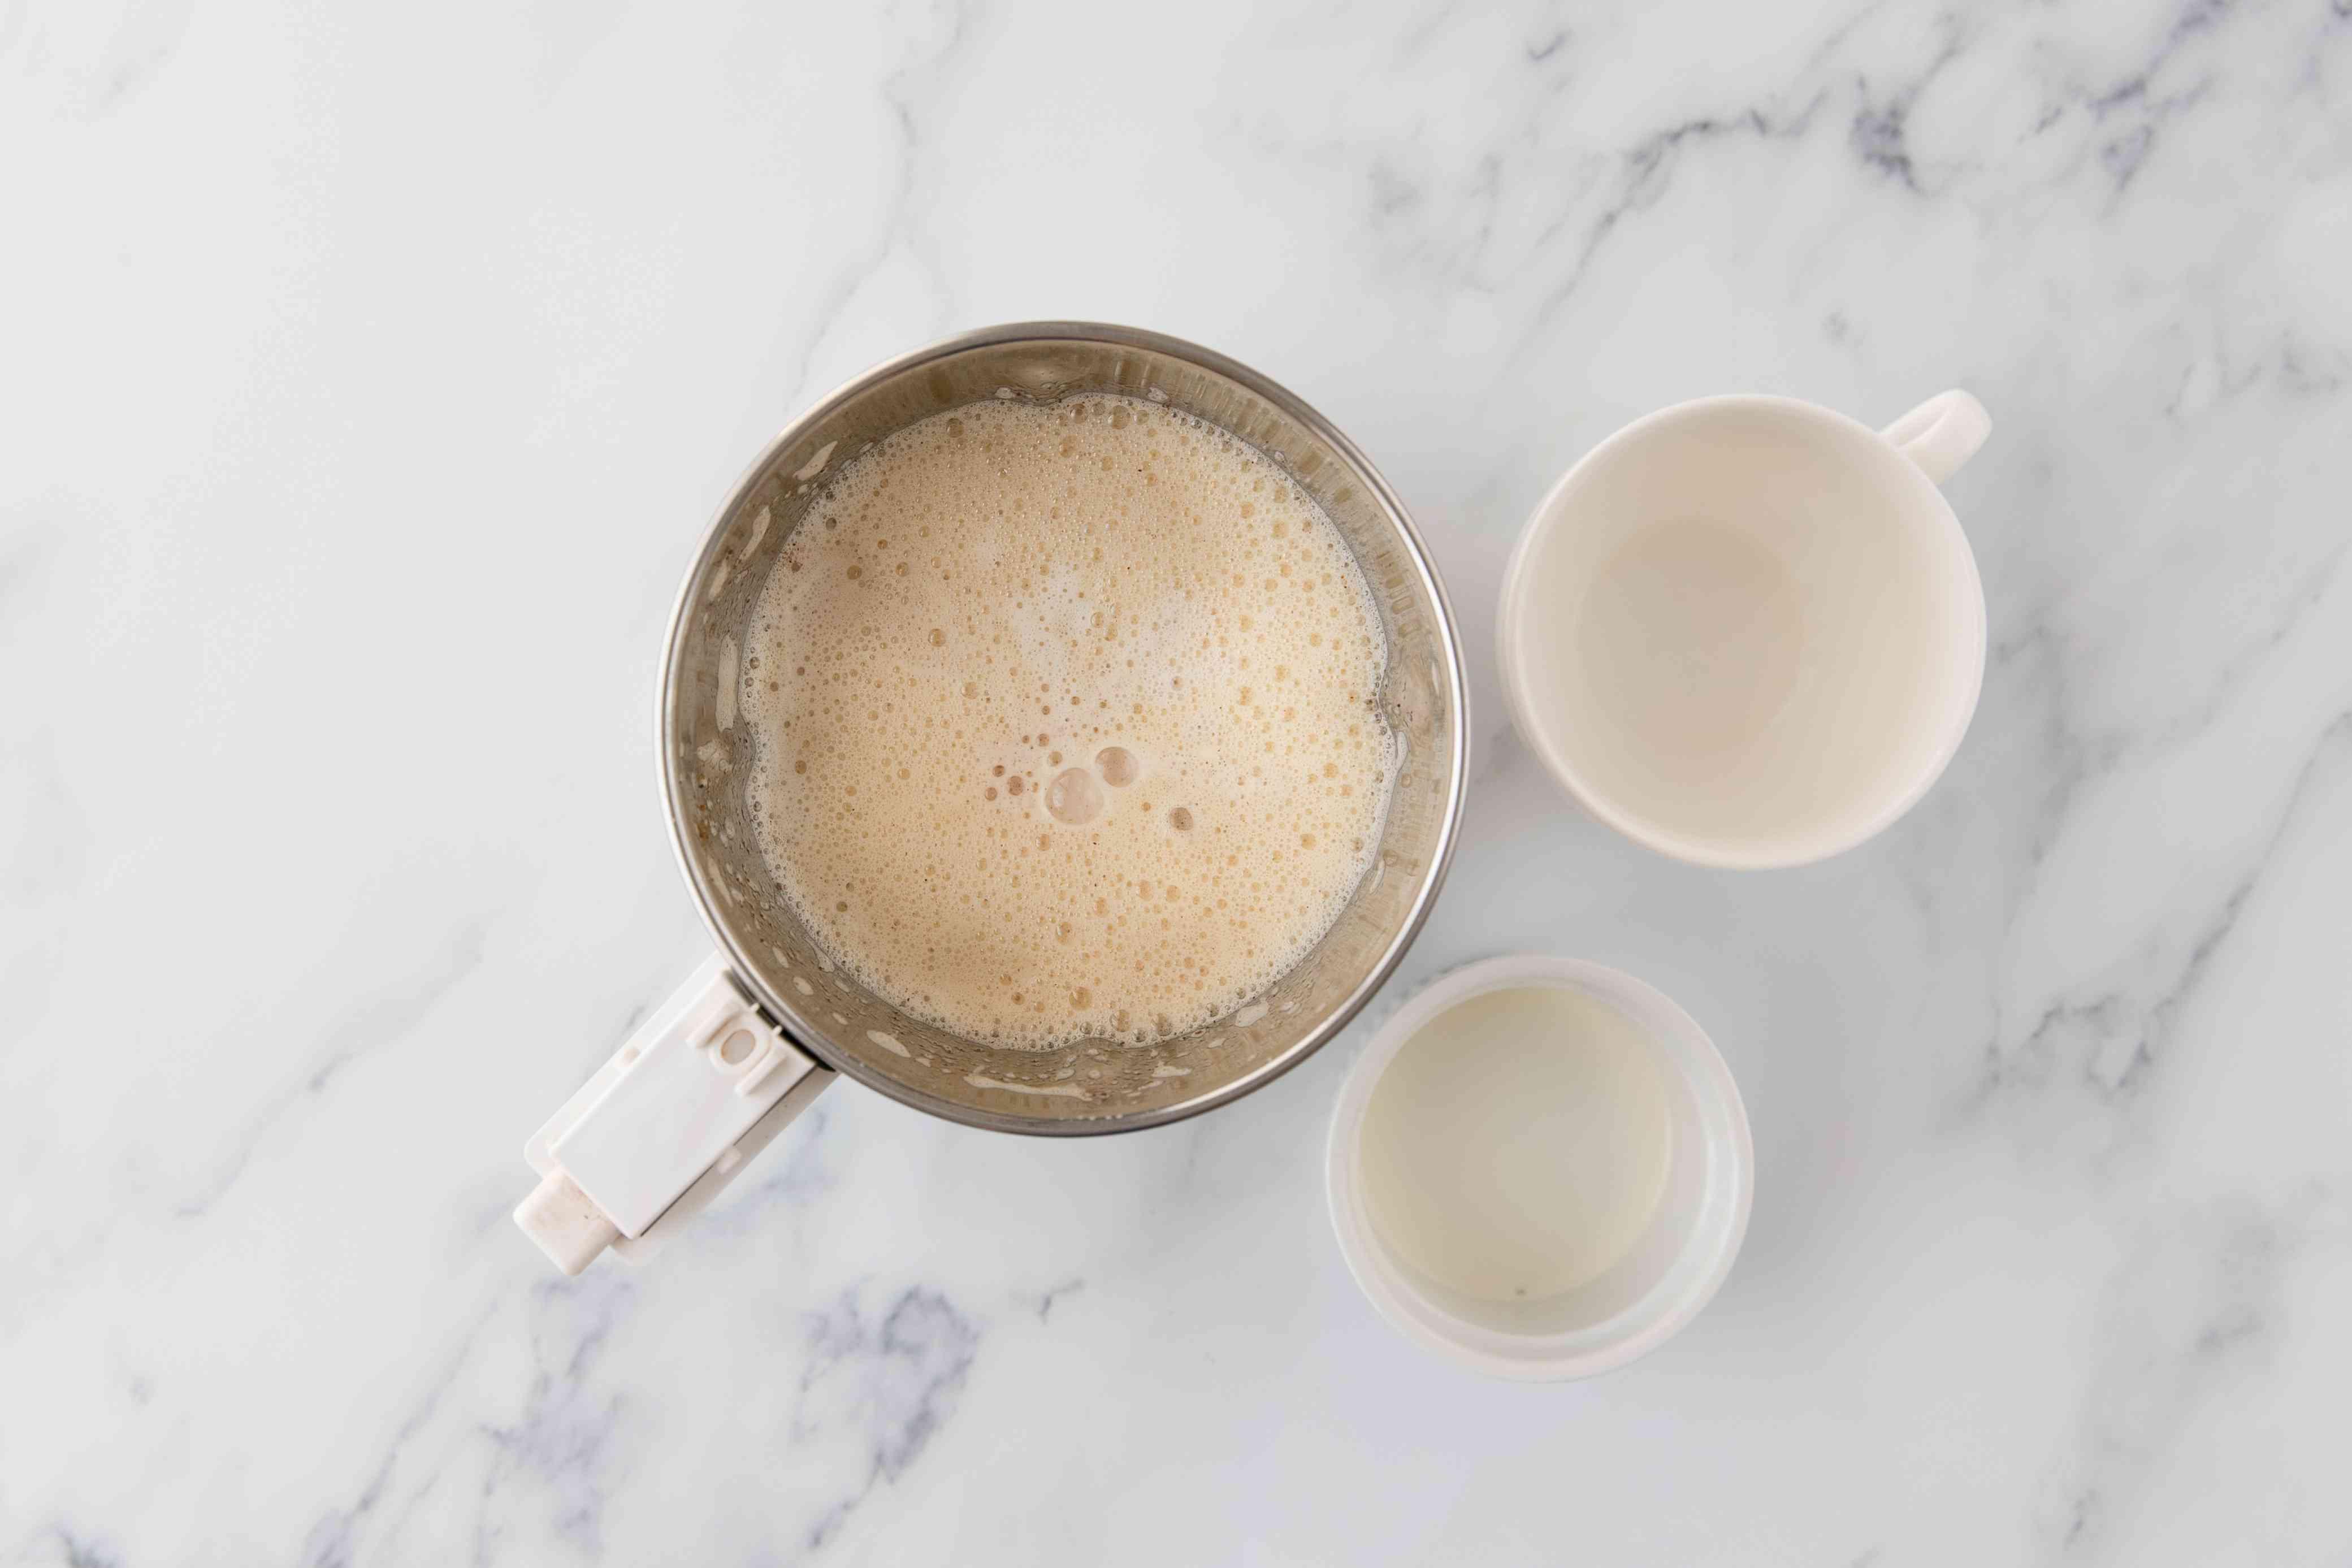 Milk and cream mixed into eggnog